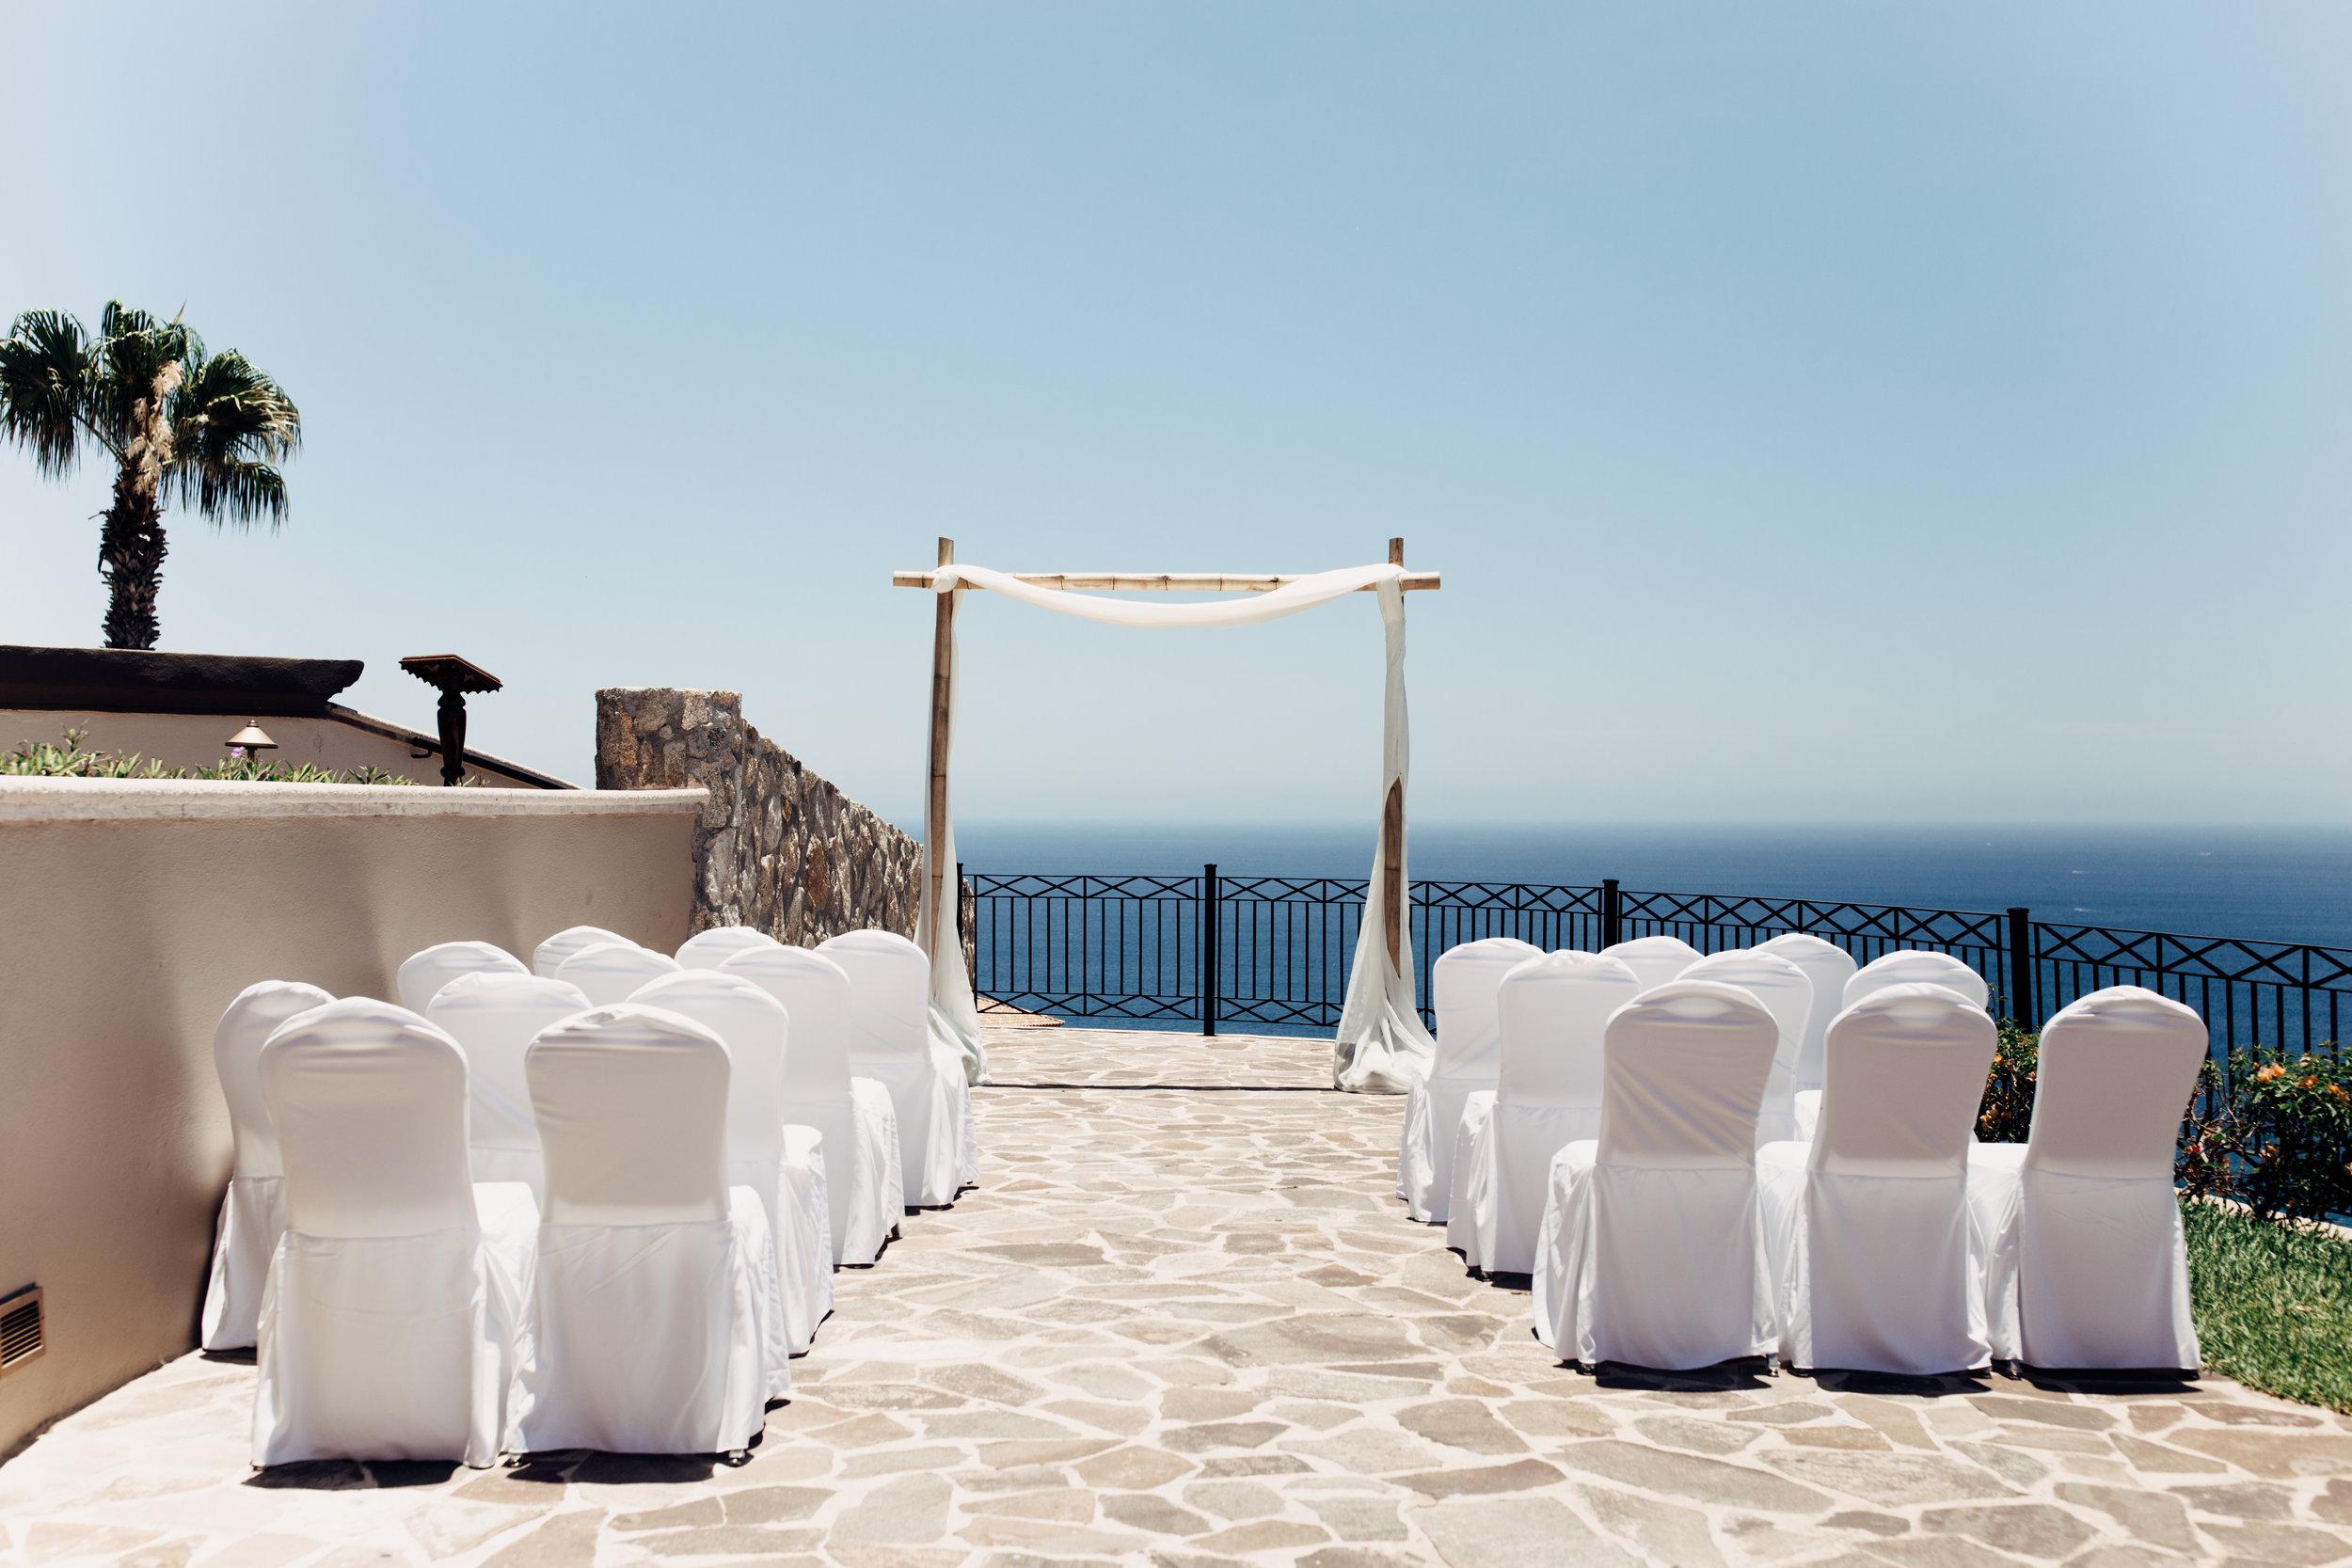 pueblo-bonito-sunset-beach-wedding-cabo-san-lucas10.jpg